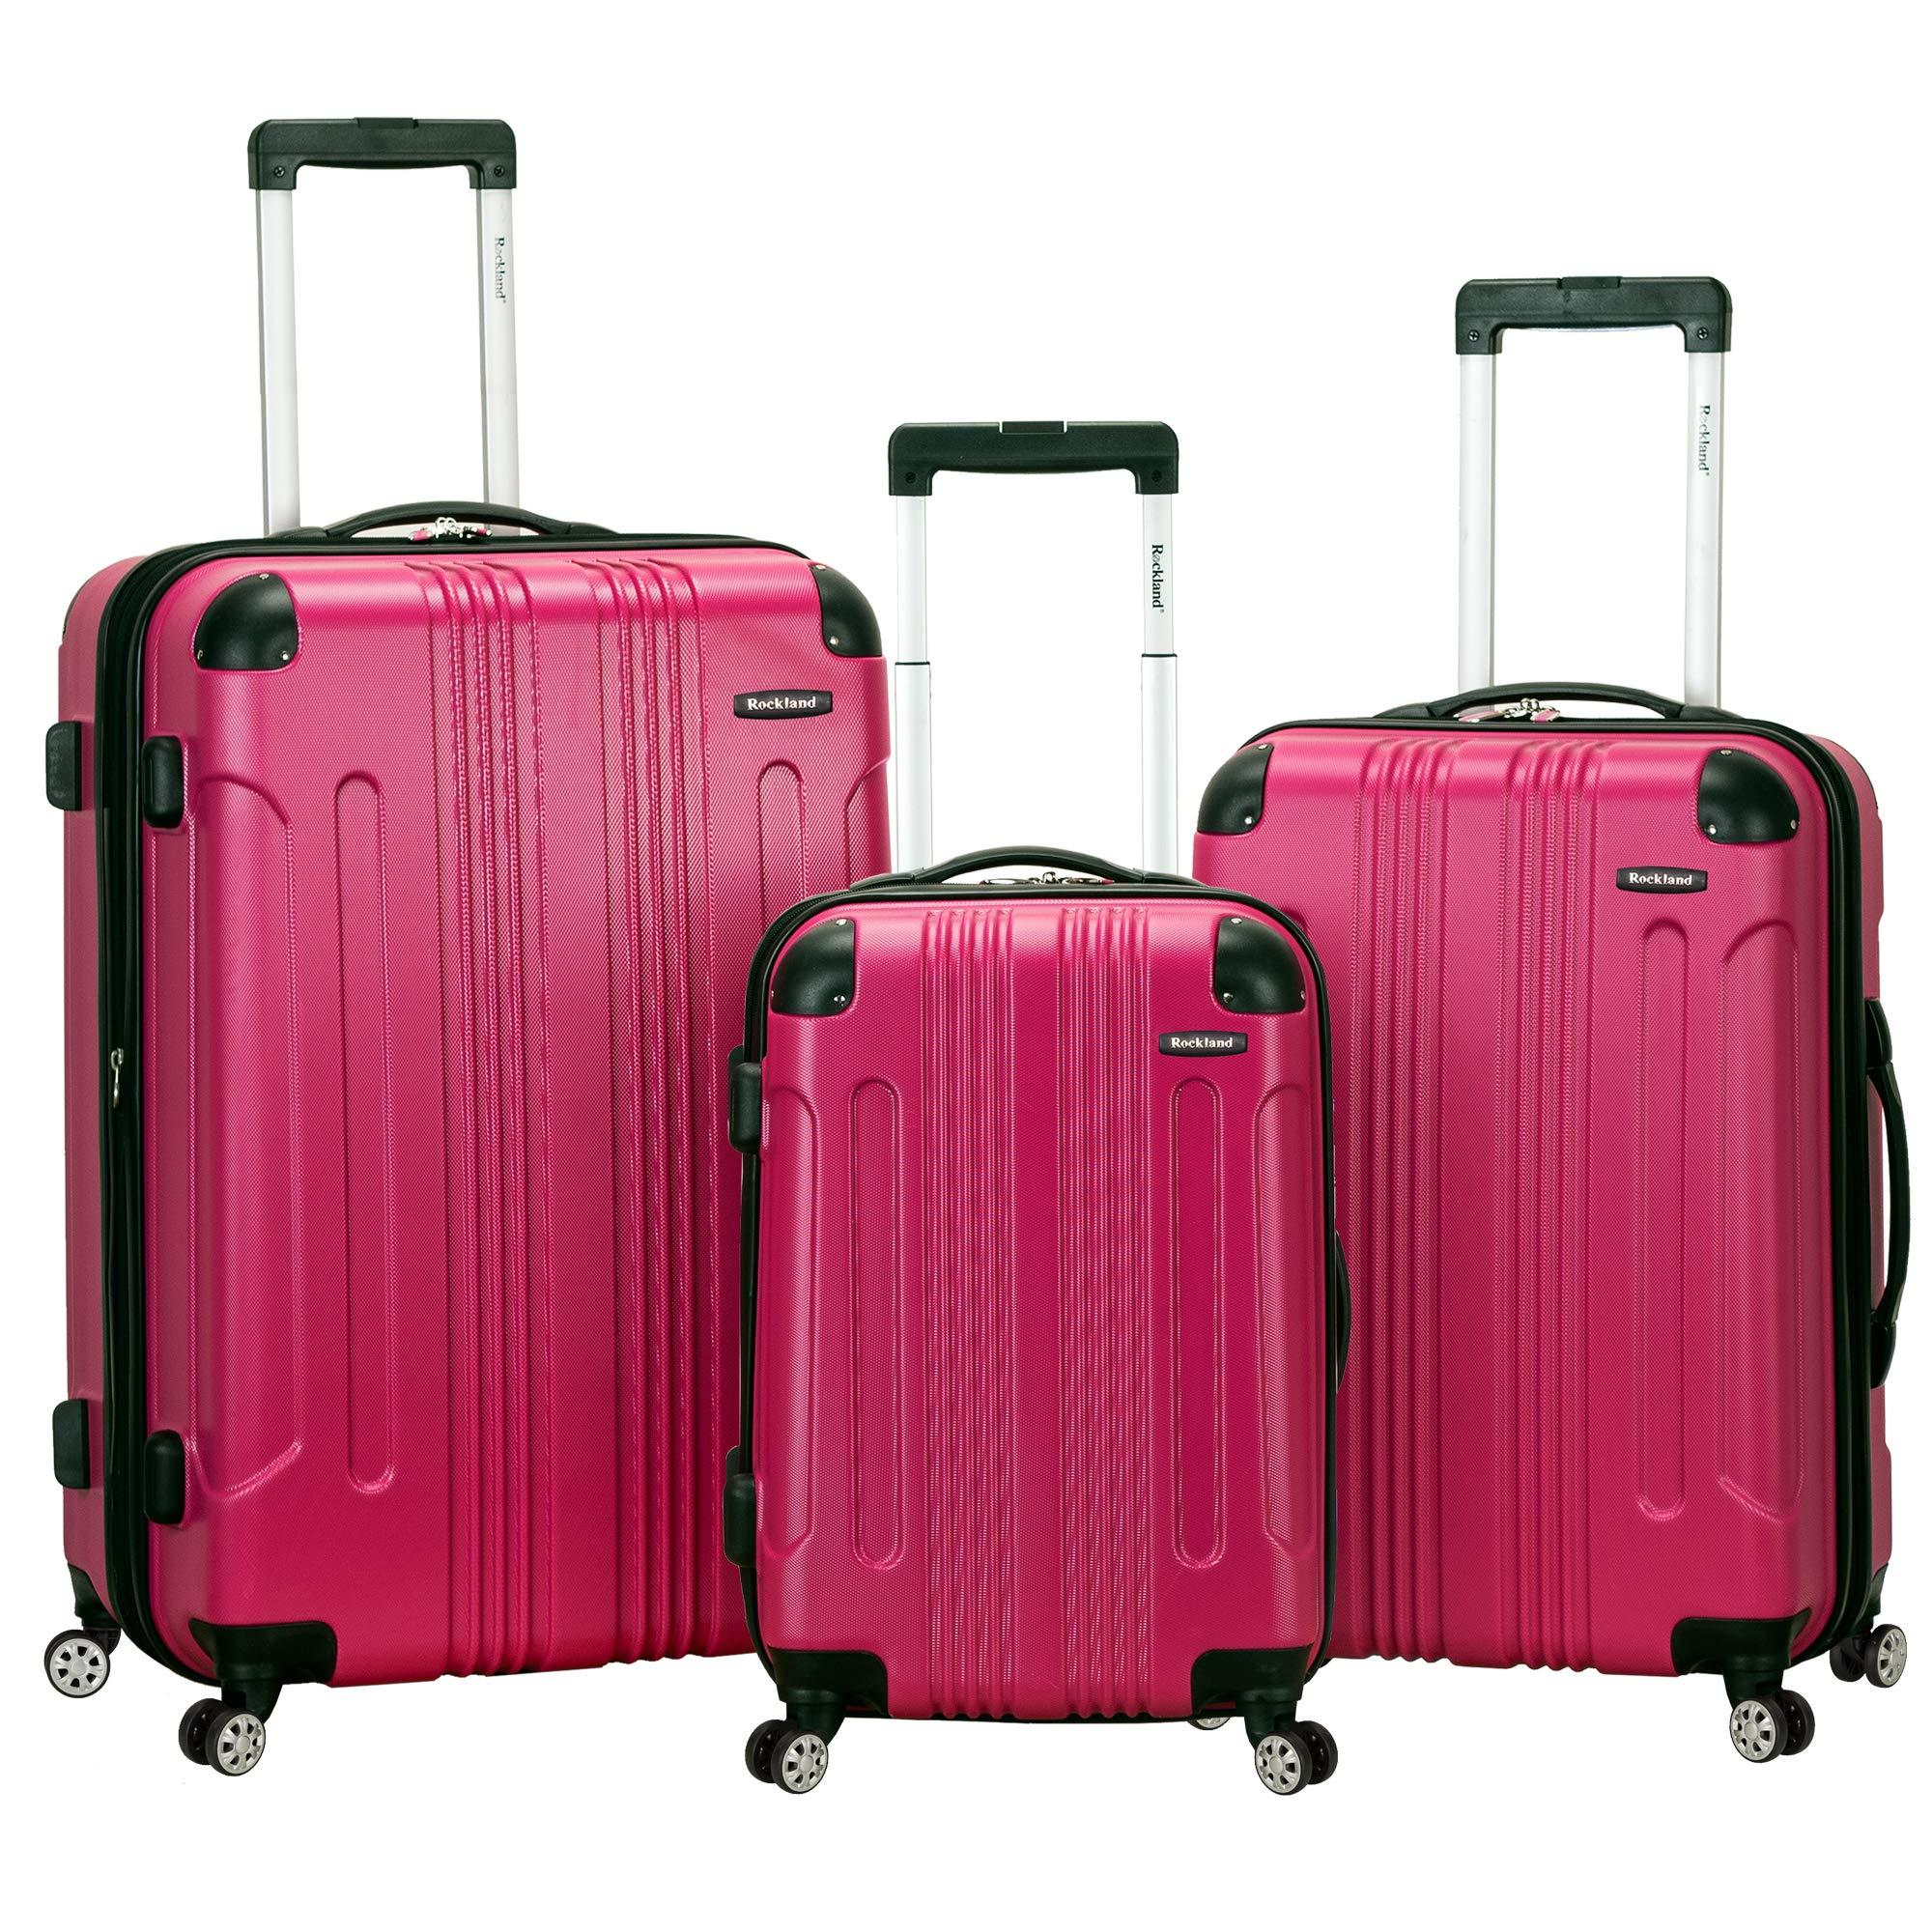 Rockland Luggage 3 Piece Sonic Upright Set, Magenta, One Size